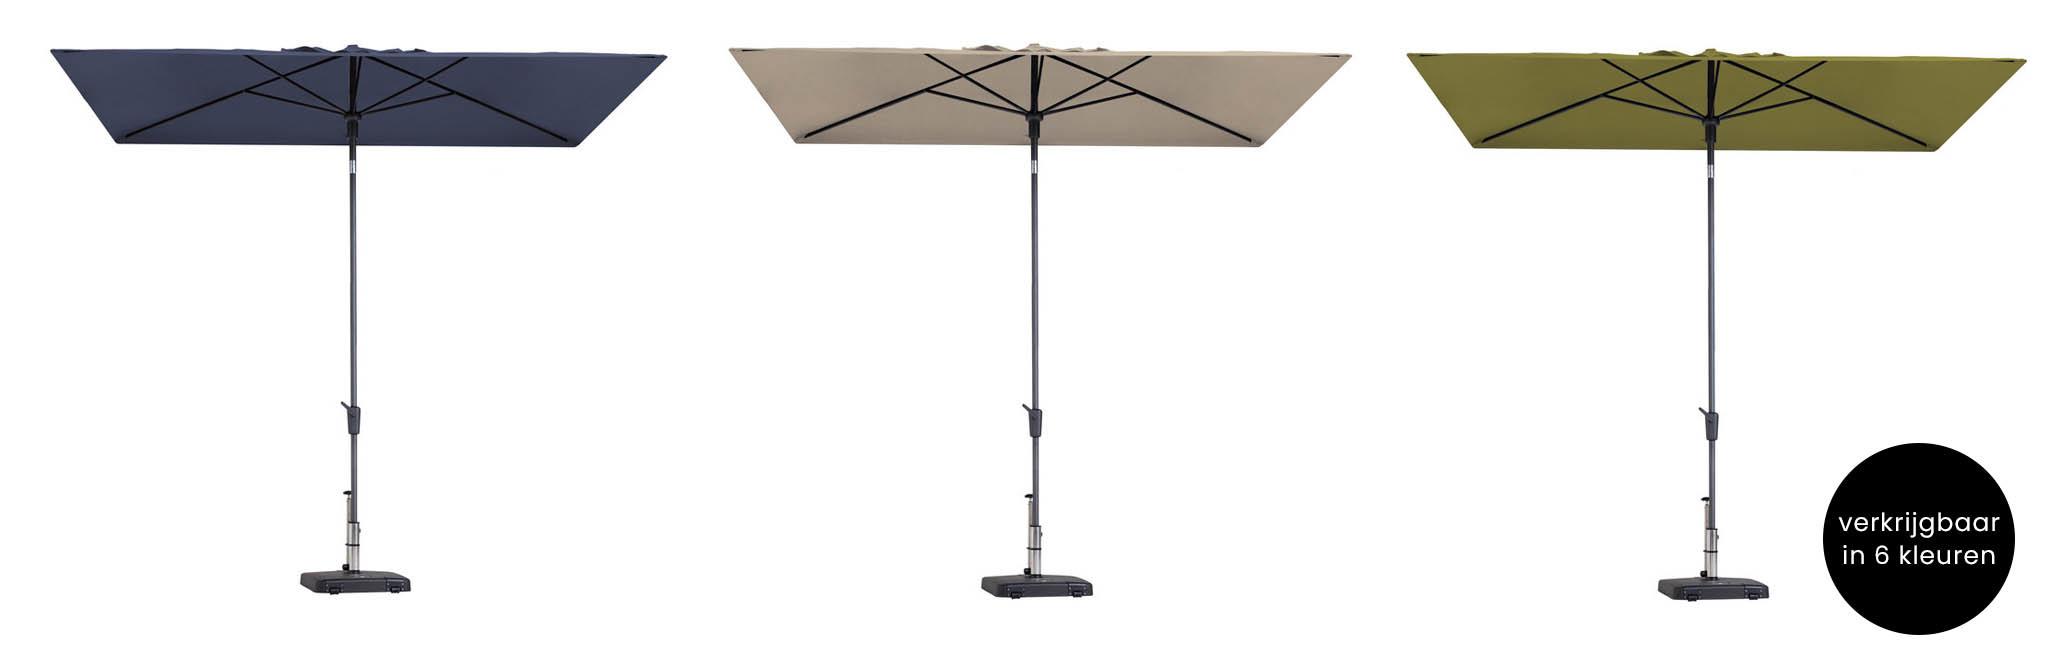 Moderne vierkante parasols